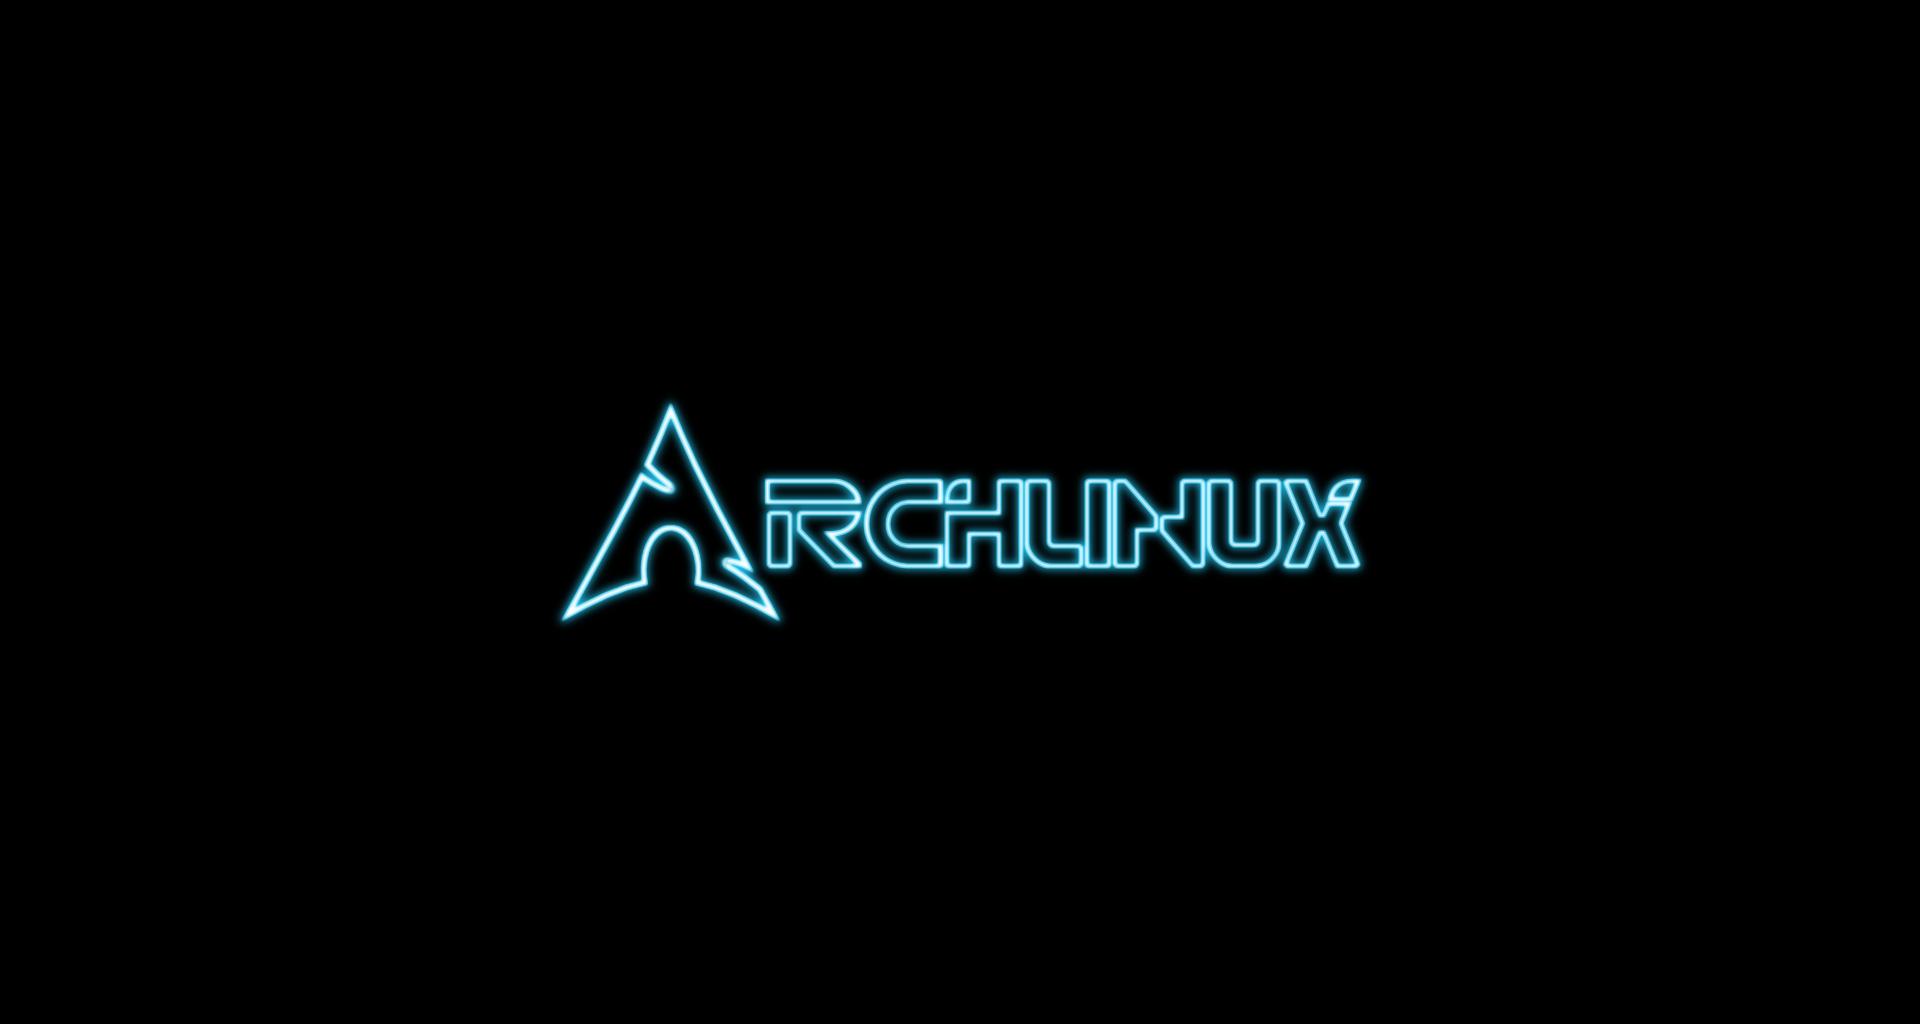 Pin Arch Linux Wallpaper 1680x1050 1920x1024